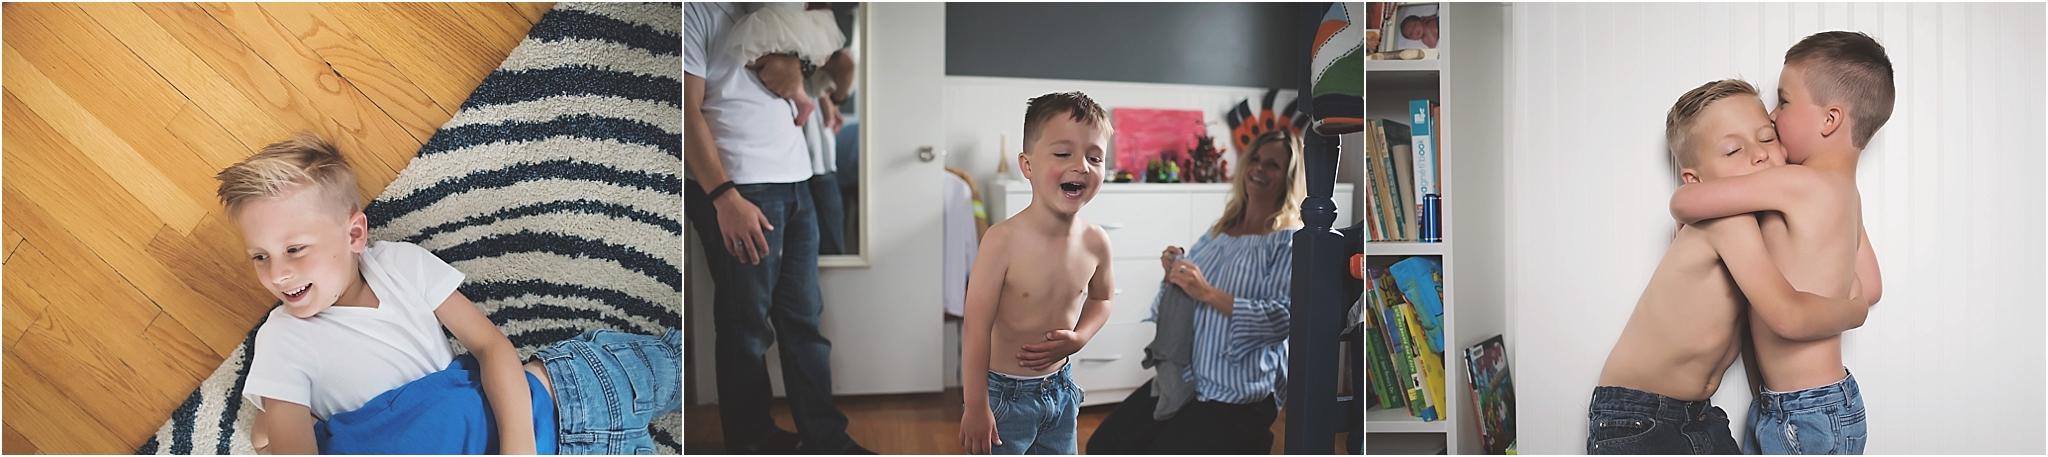 karra lynn photography - family lifestyle photographer michigan - having fun